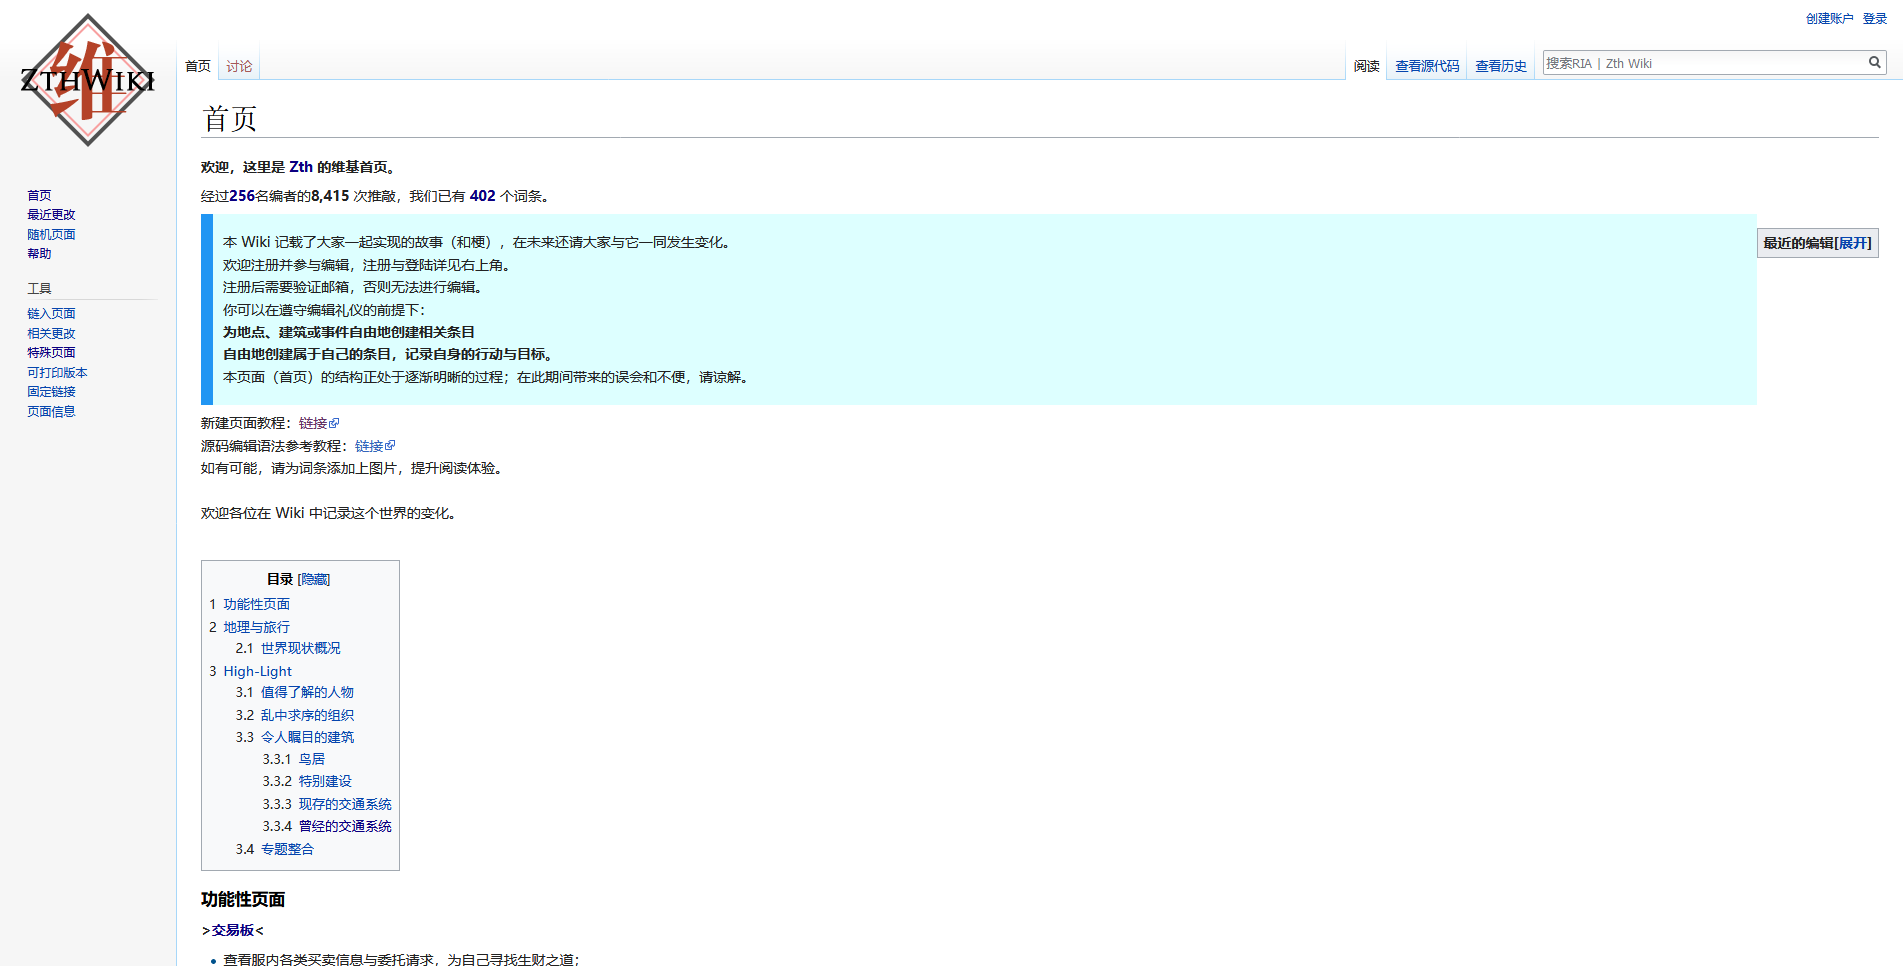 RIA_Zth_Wiki-MainPage.png